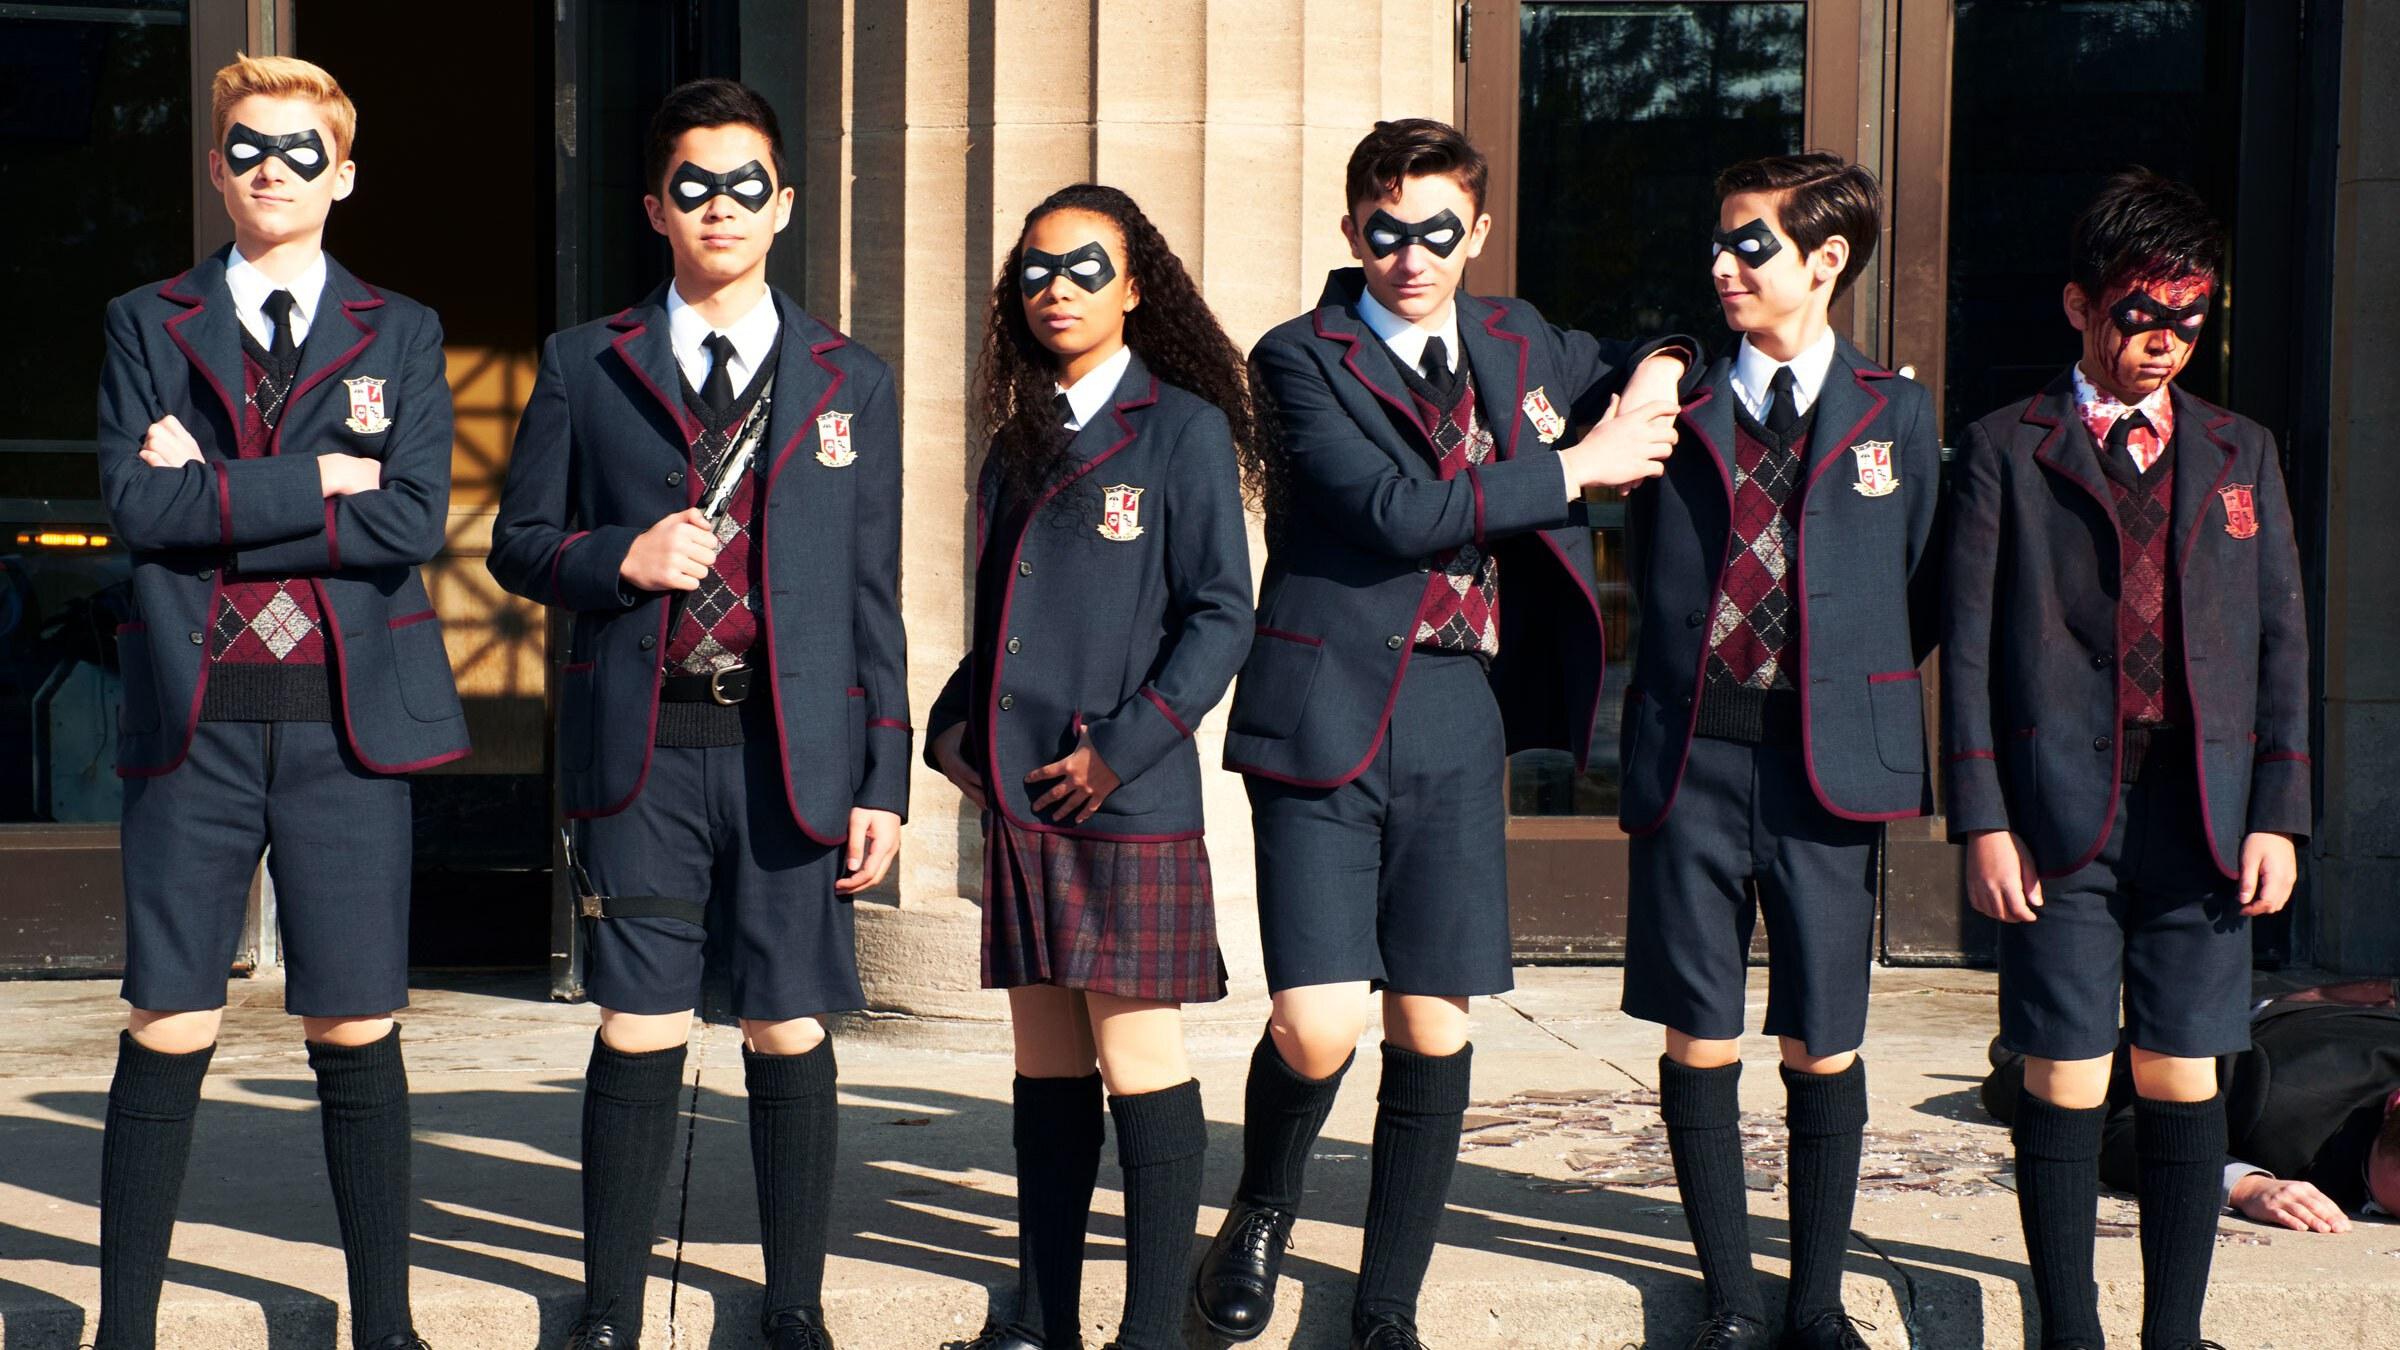 serie The Umbrella Academy